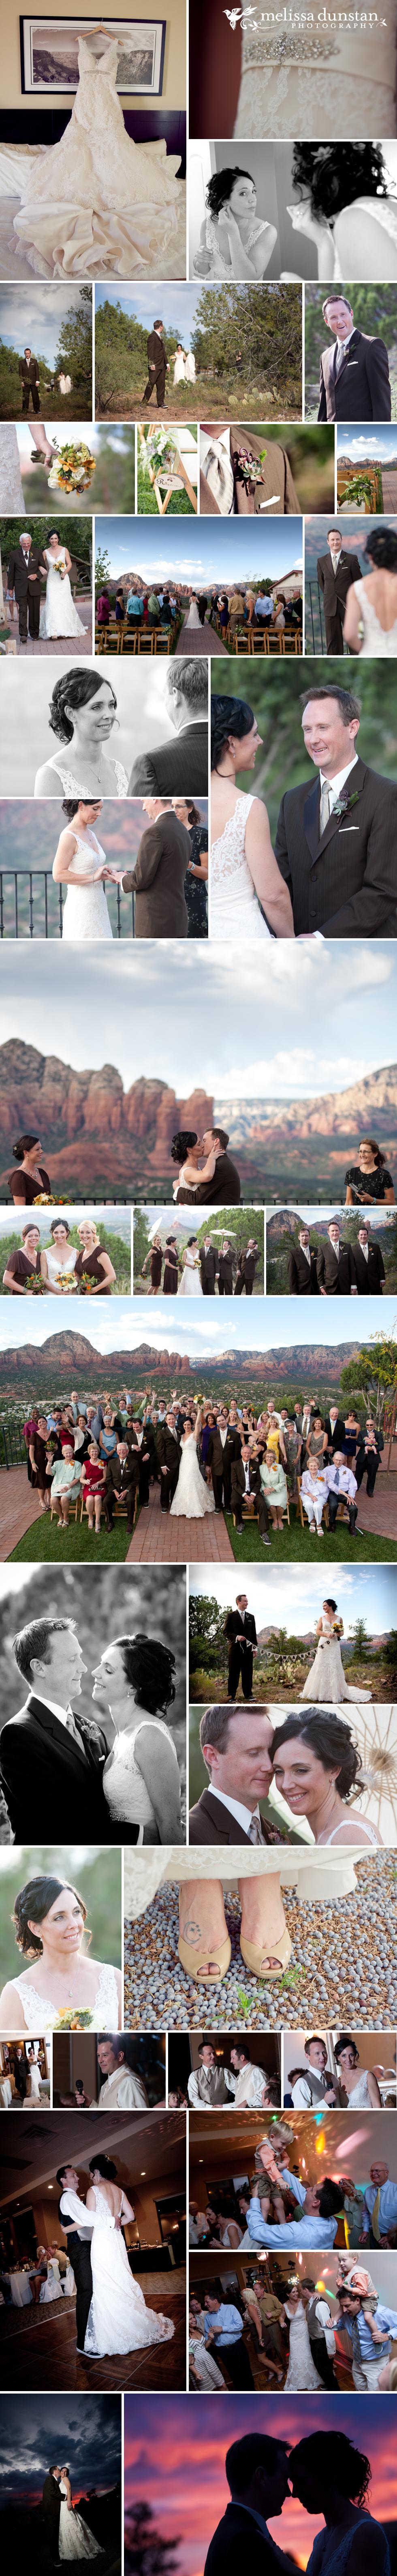 Sedona Wedding Photographer, Scottsdale Wedding photographer, Phoenix Wedding Photographer, Flagstaff Wedding Photographer, New Orleans, Kauai, Lake Tahoe, Aspen